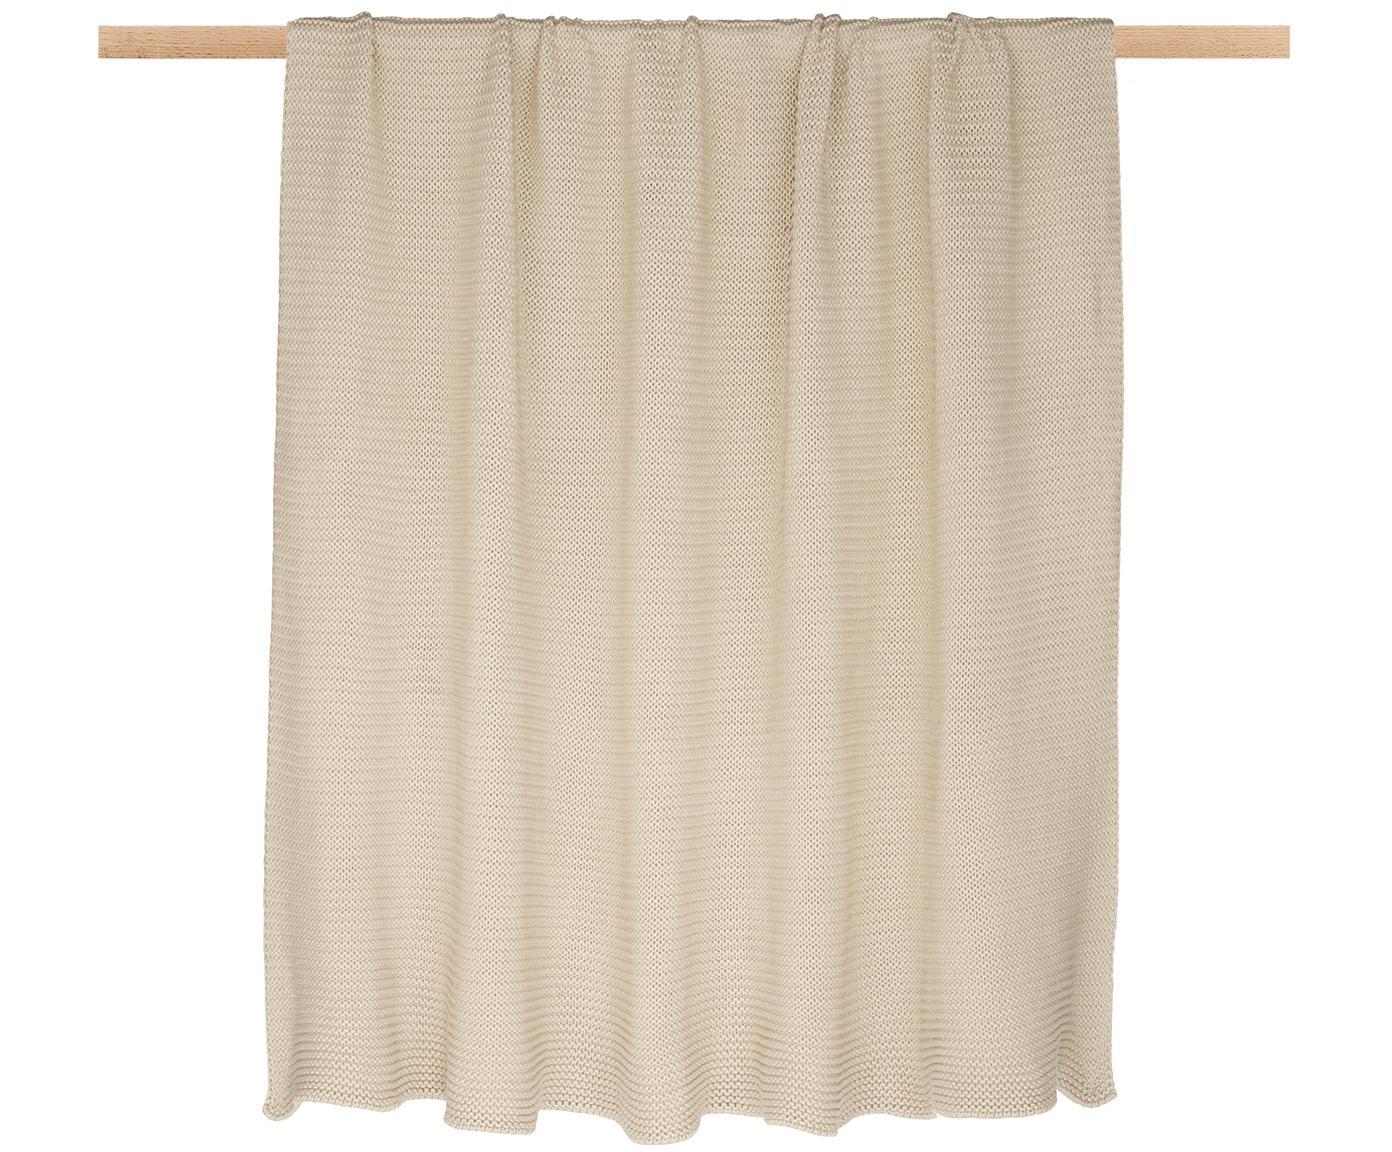 Plaid fatto a maglia Adalyn, 100% cotone, Beige, Larg. 150 x Lung. 200 cm